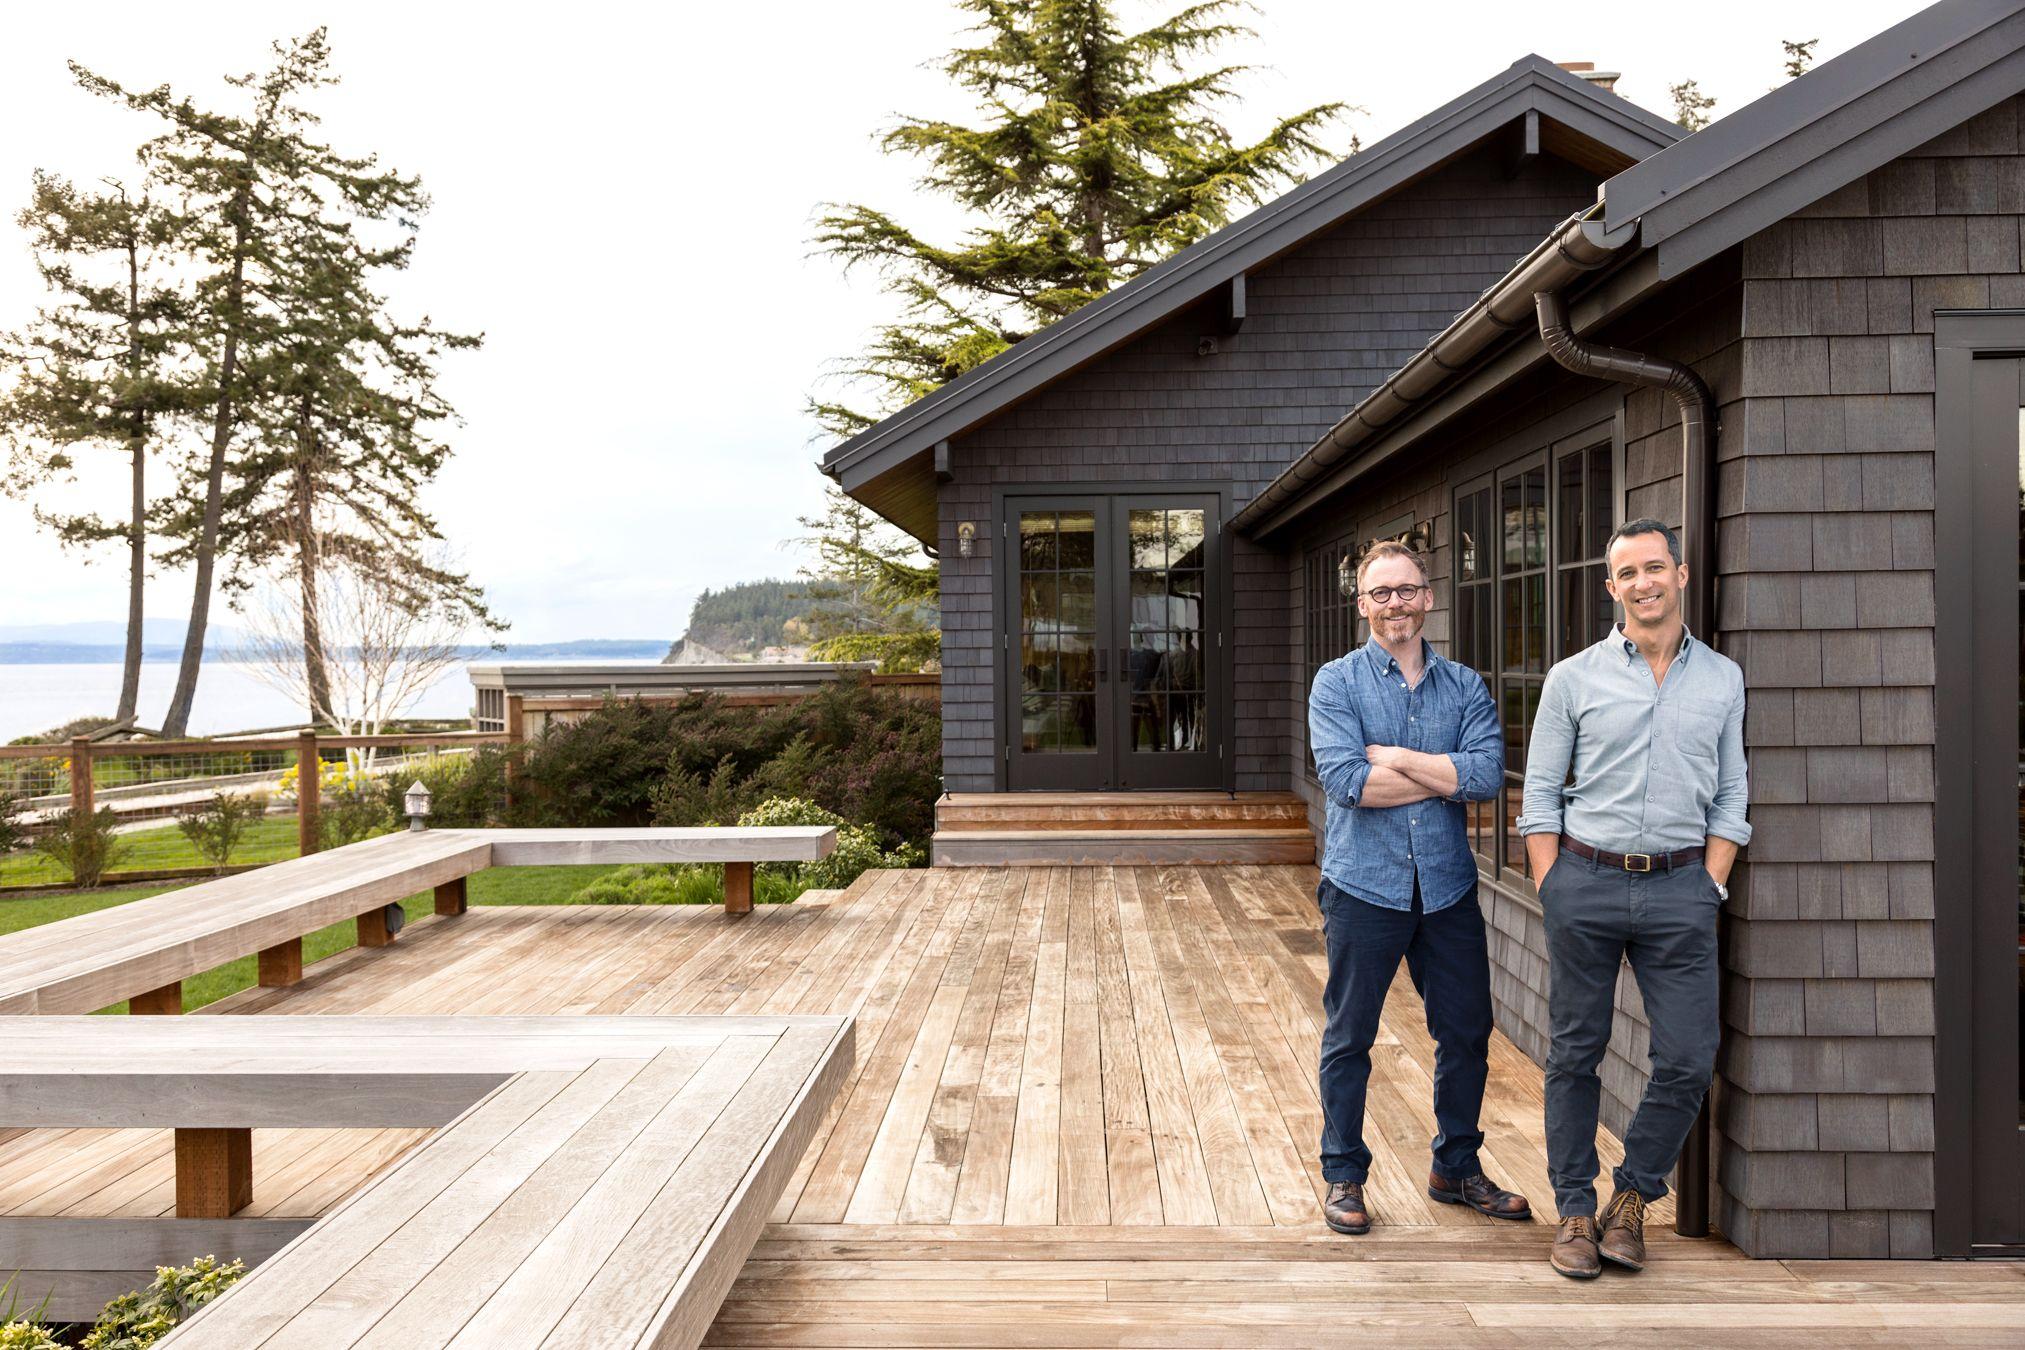 25 Creative Deck Ideas Beautiful Outdoor Deck Designs